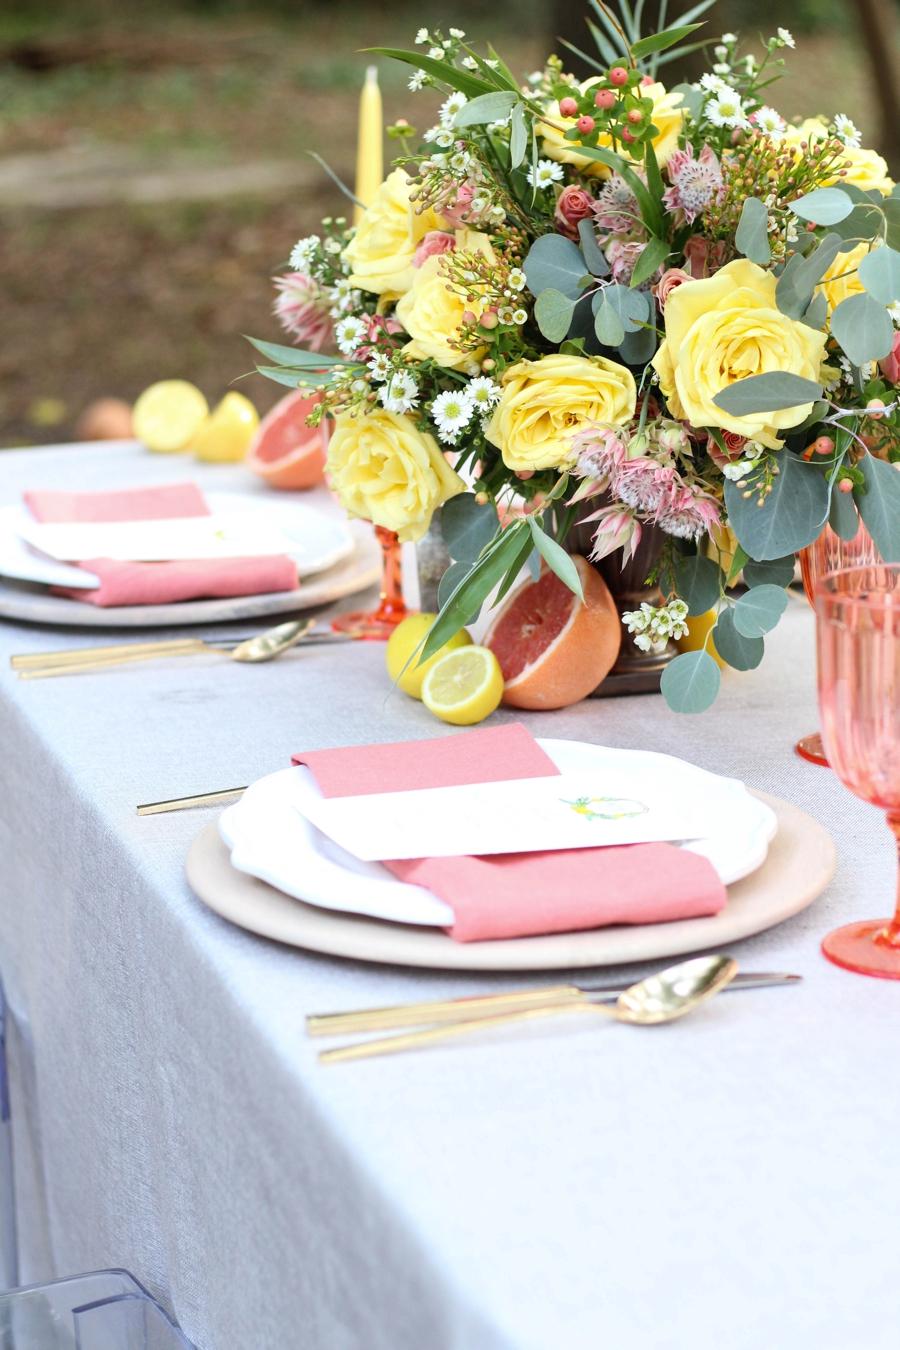 Citrus Inspired Wedding Ideas: 1 Theme, 3 Ways via TheELD.com